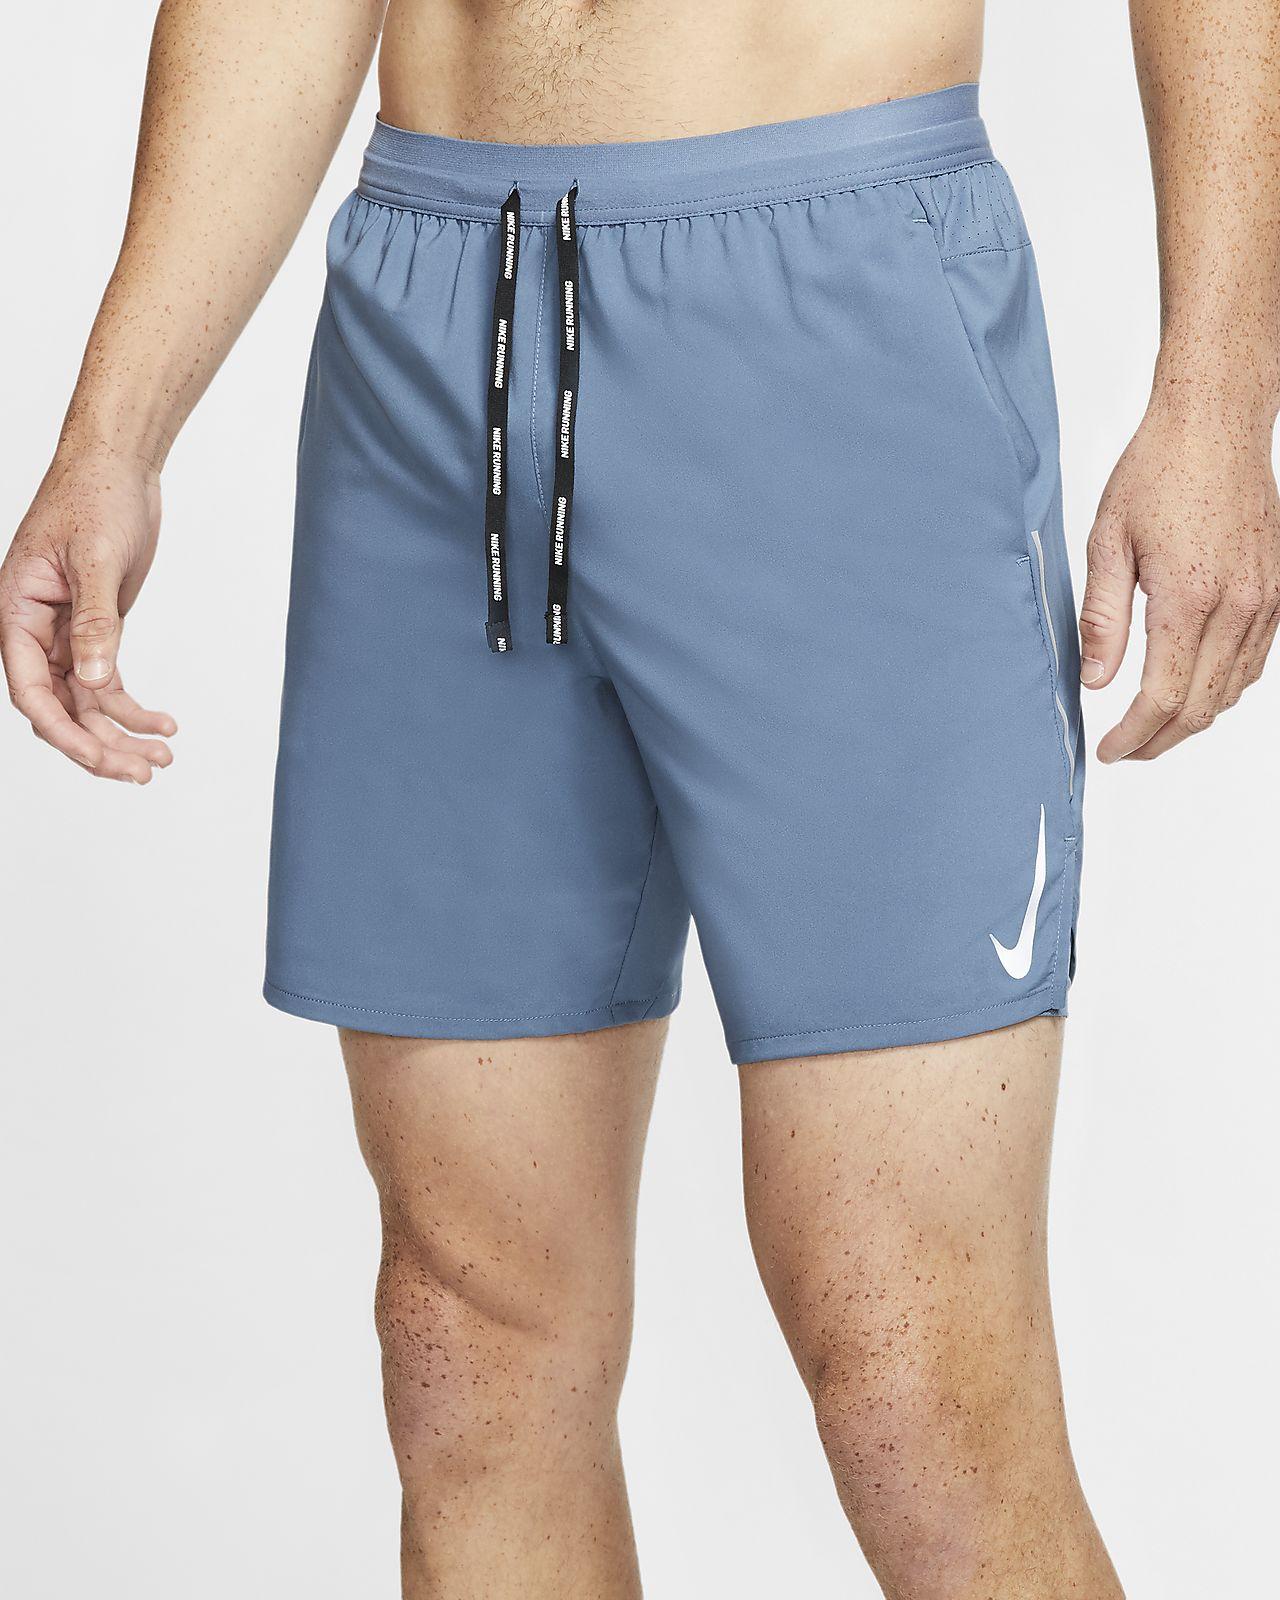 Shorts da running 2-in-1 18 cm Nike Dri-FIT Flex Stride - Uomo